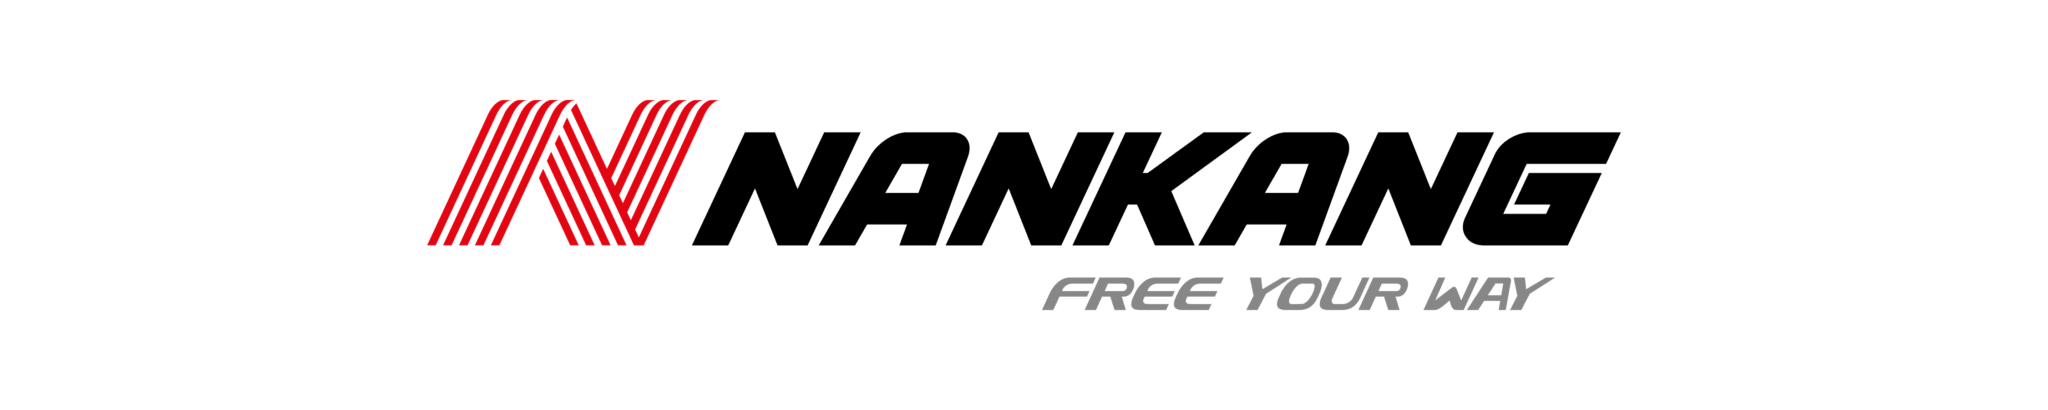 Nankang - DekkTeam